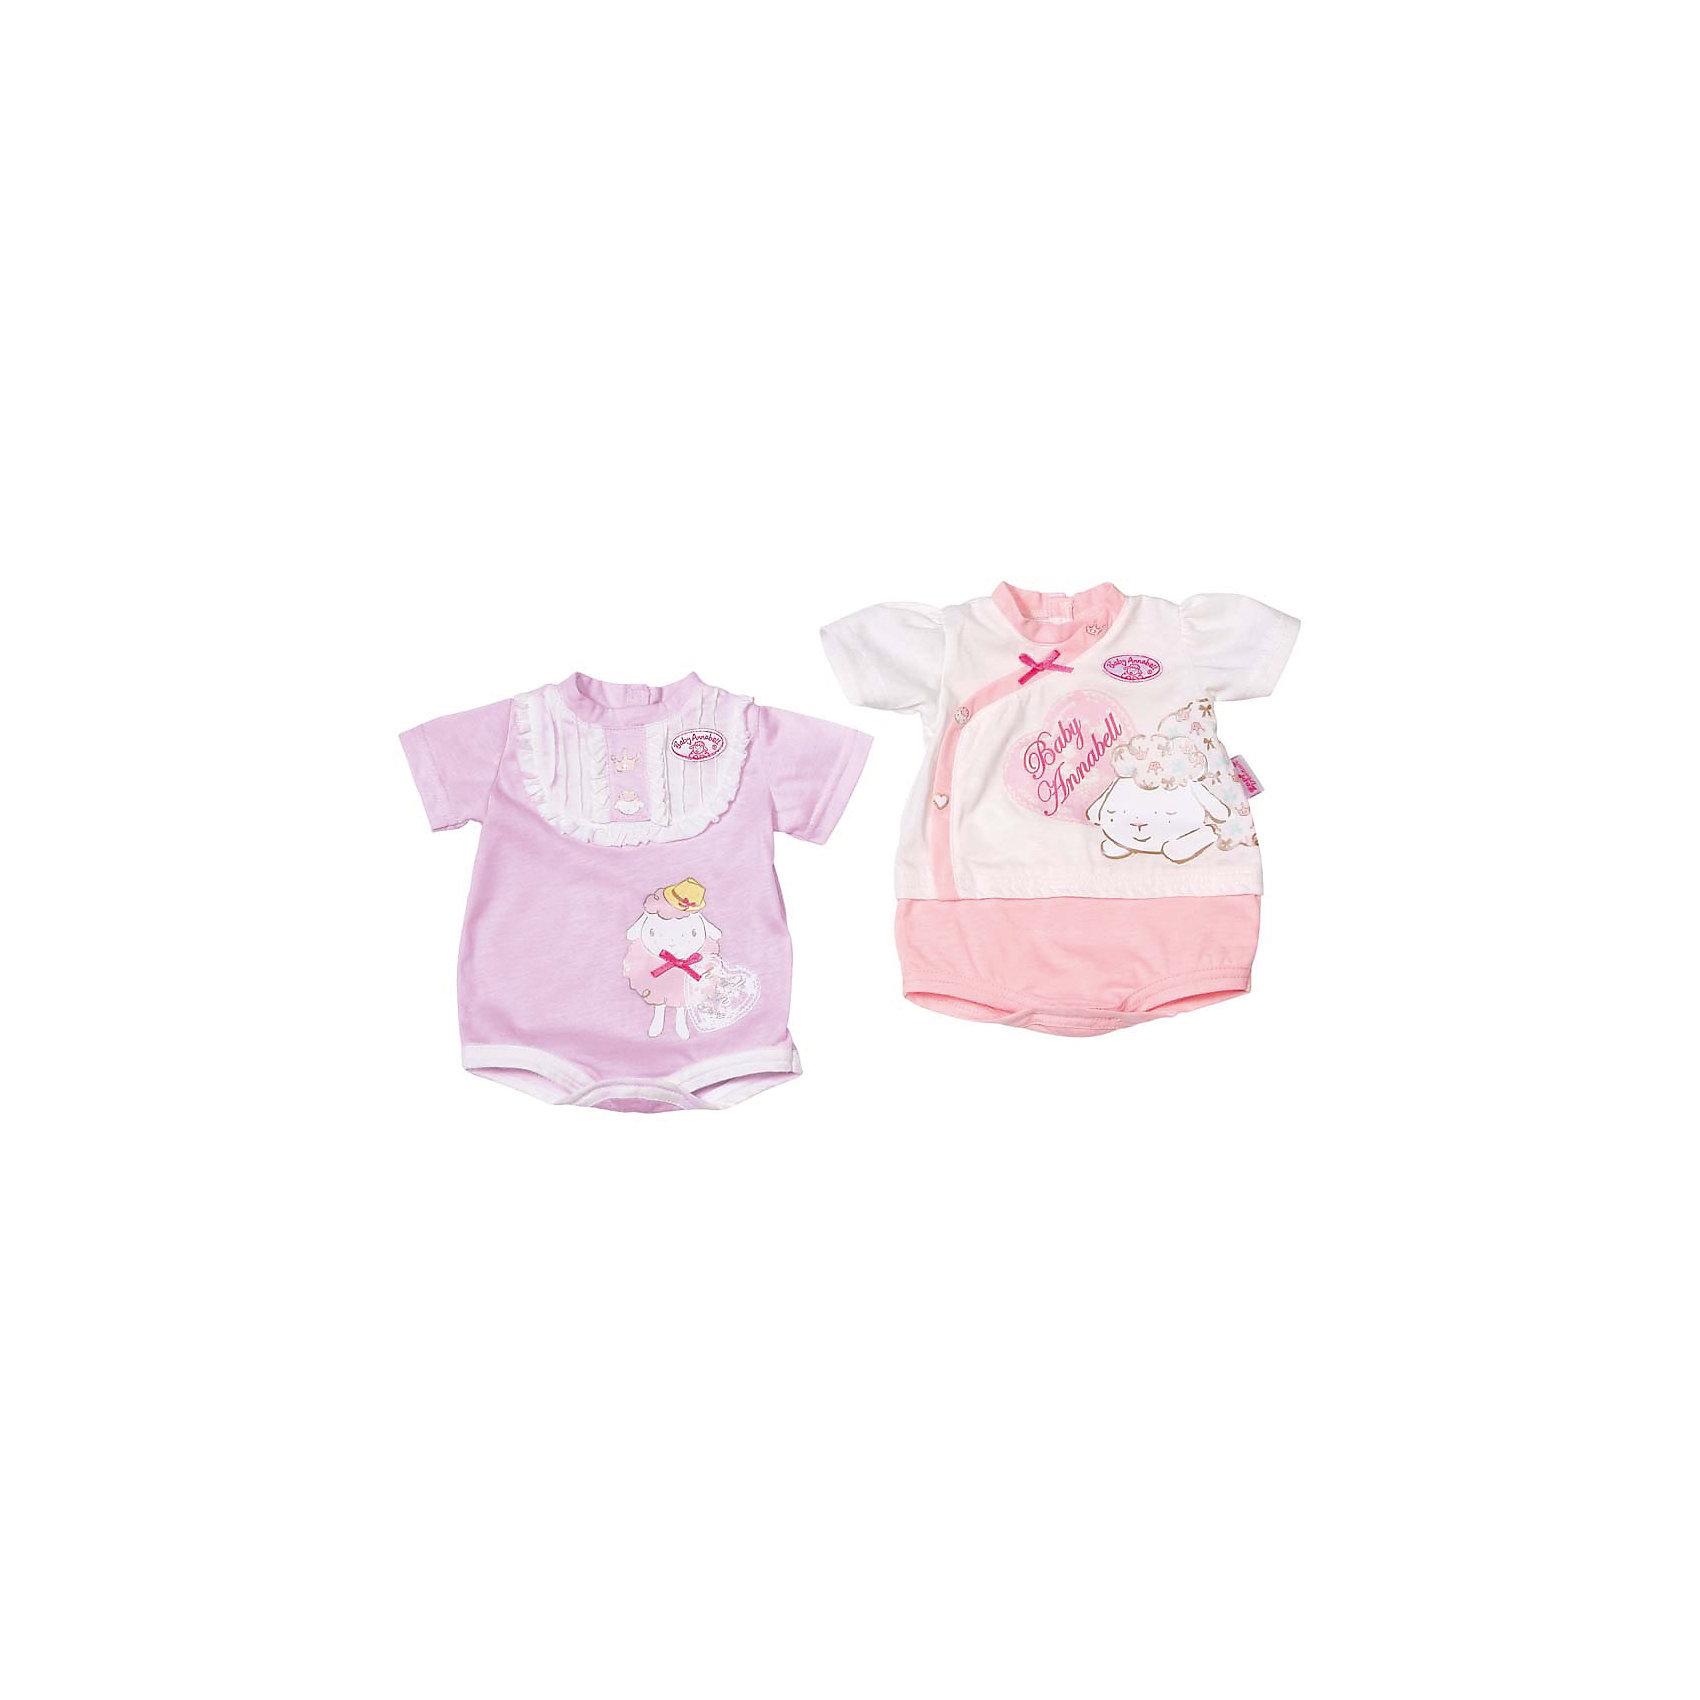 Zapf Creation Нижнее белье, розовый, Baby Annabell zapf creation нижнее белье белый baby annabell